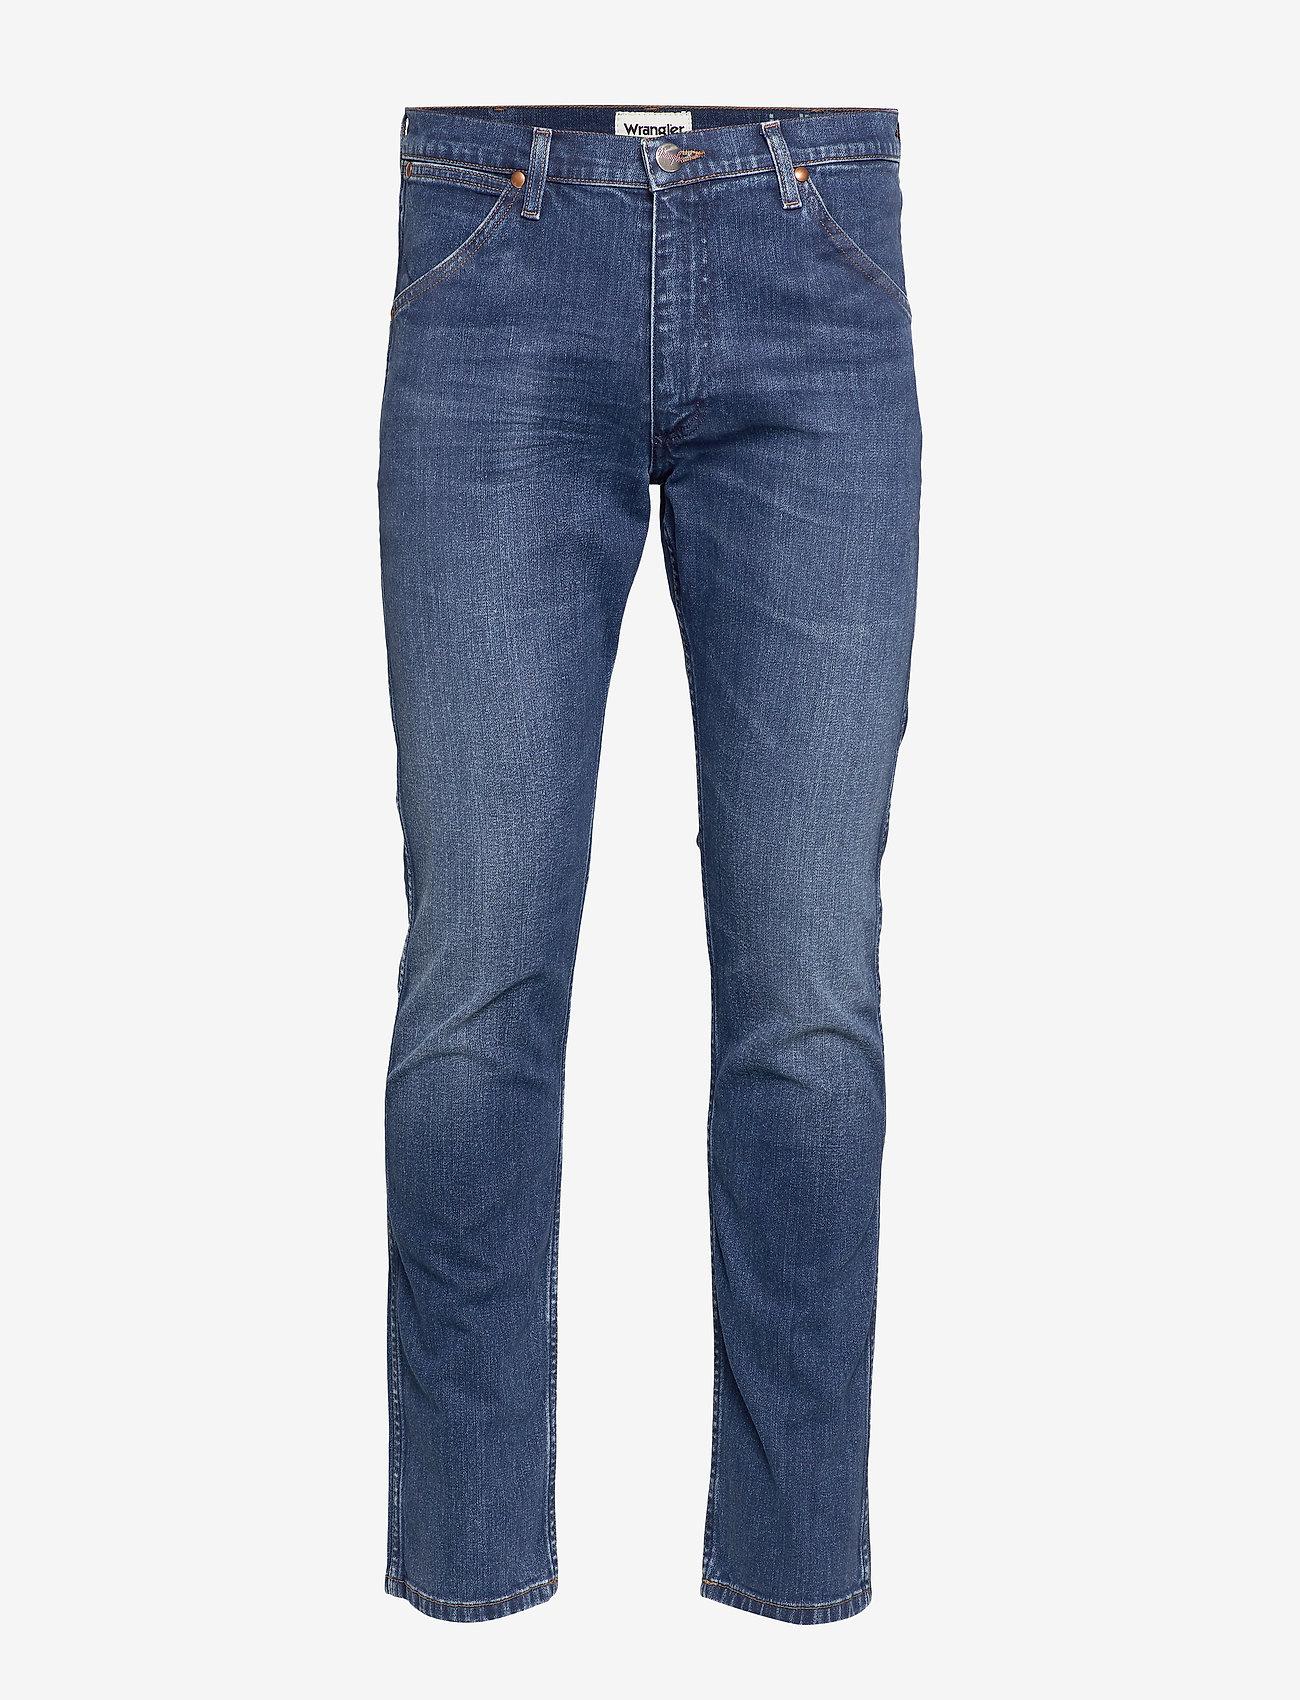 Wrangler 11MWZ - Jeans GOOD DAY 0eLM8lCr